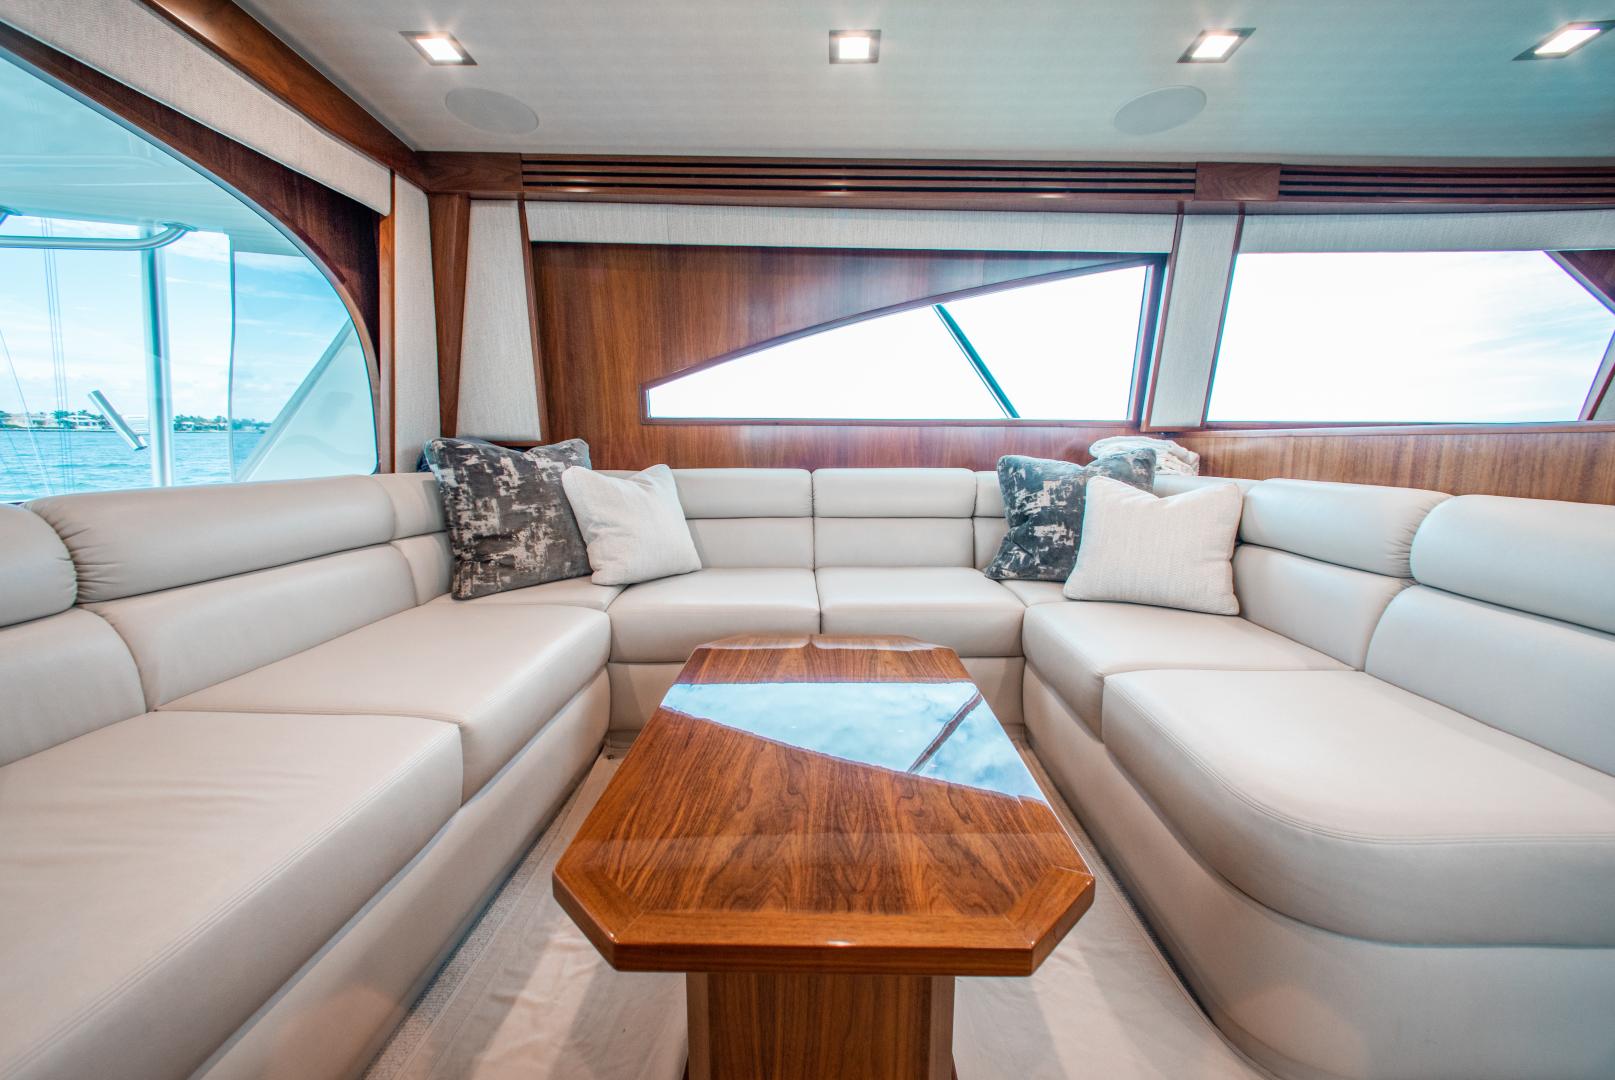 Viking-72 Enclosed Bridge 2018-Red Lion Ocean Reef-Florida-United States-2018 Viking 72 Enclosed Bridge  Red Lion  Salon-1568239   Thumbnail